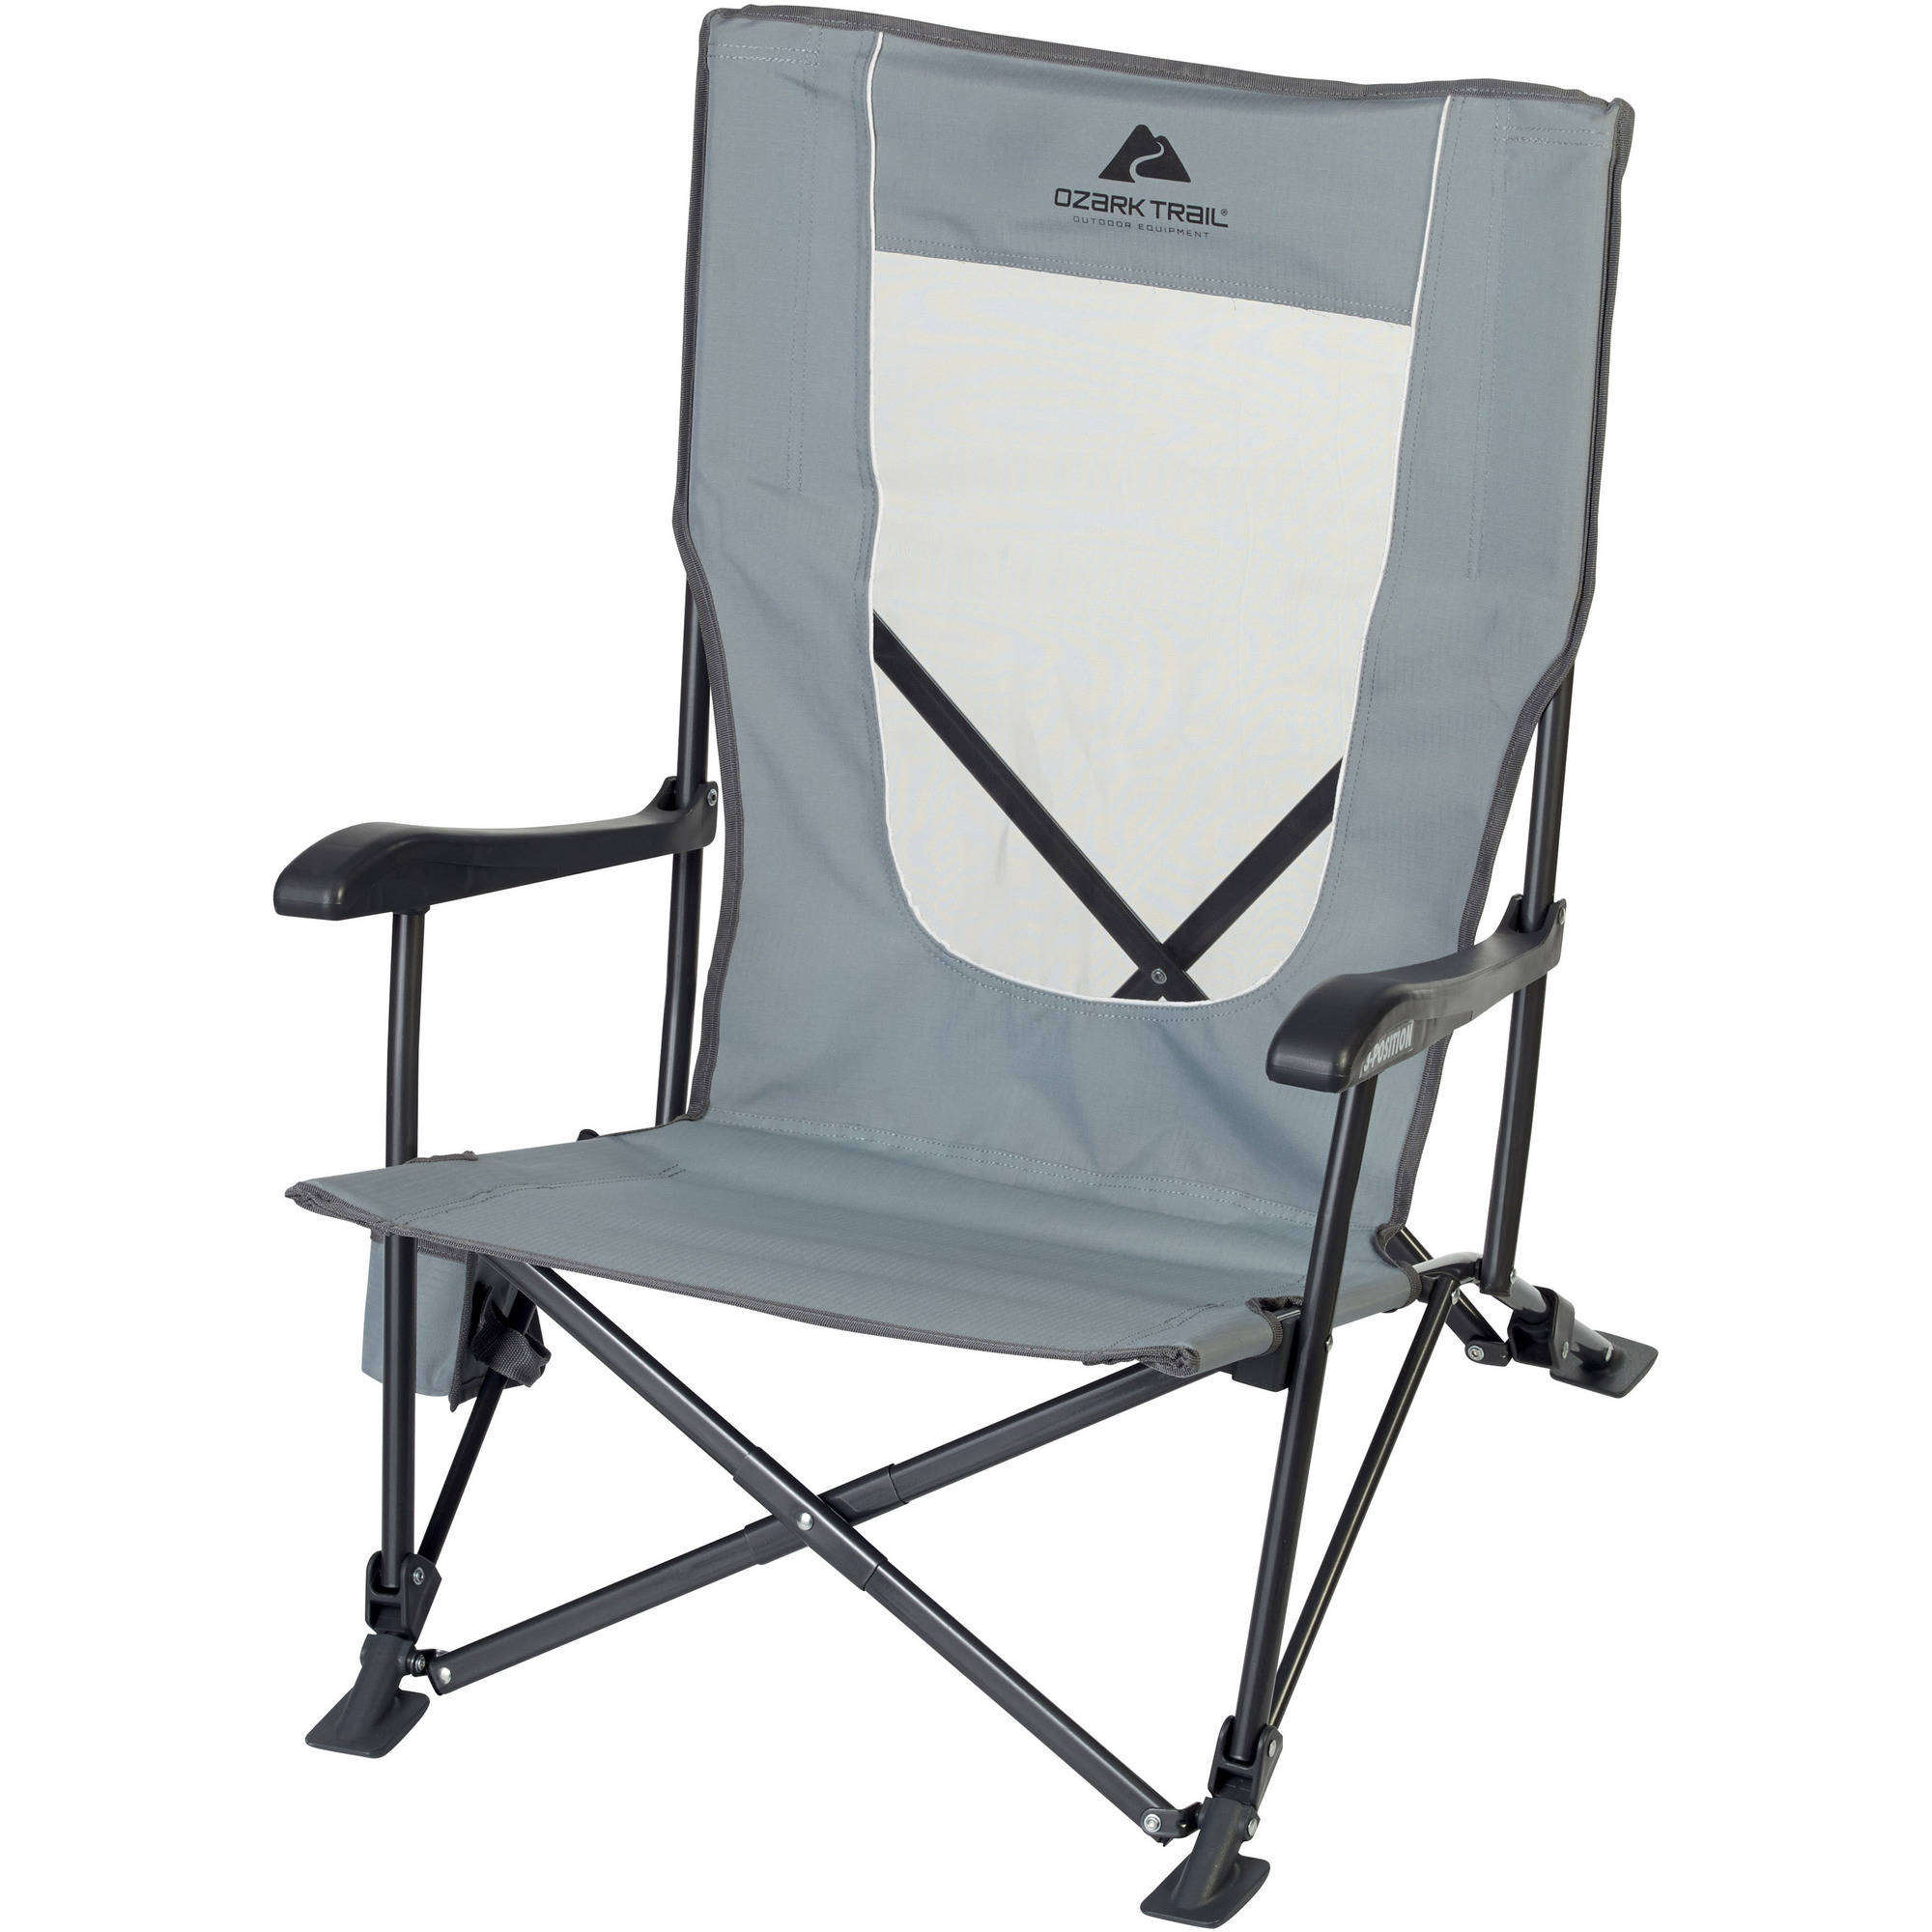 Ozark Trail 3Position Low Profile Chair  Walmartcom